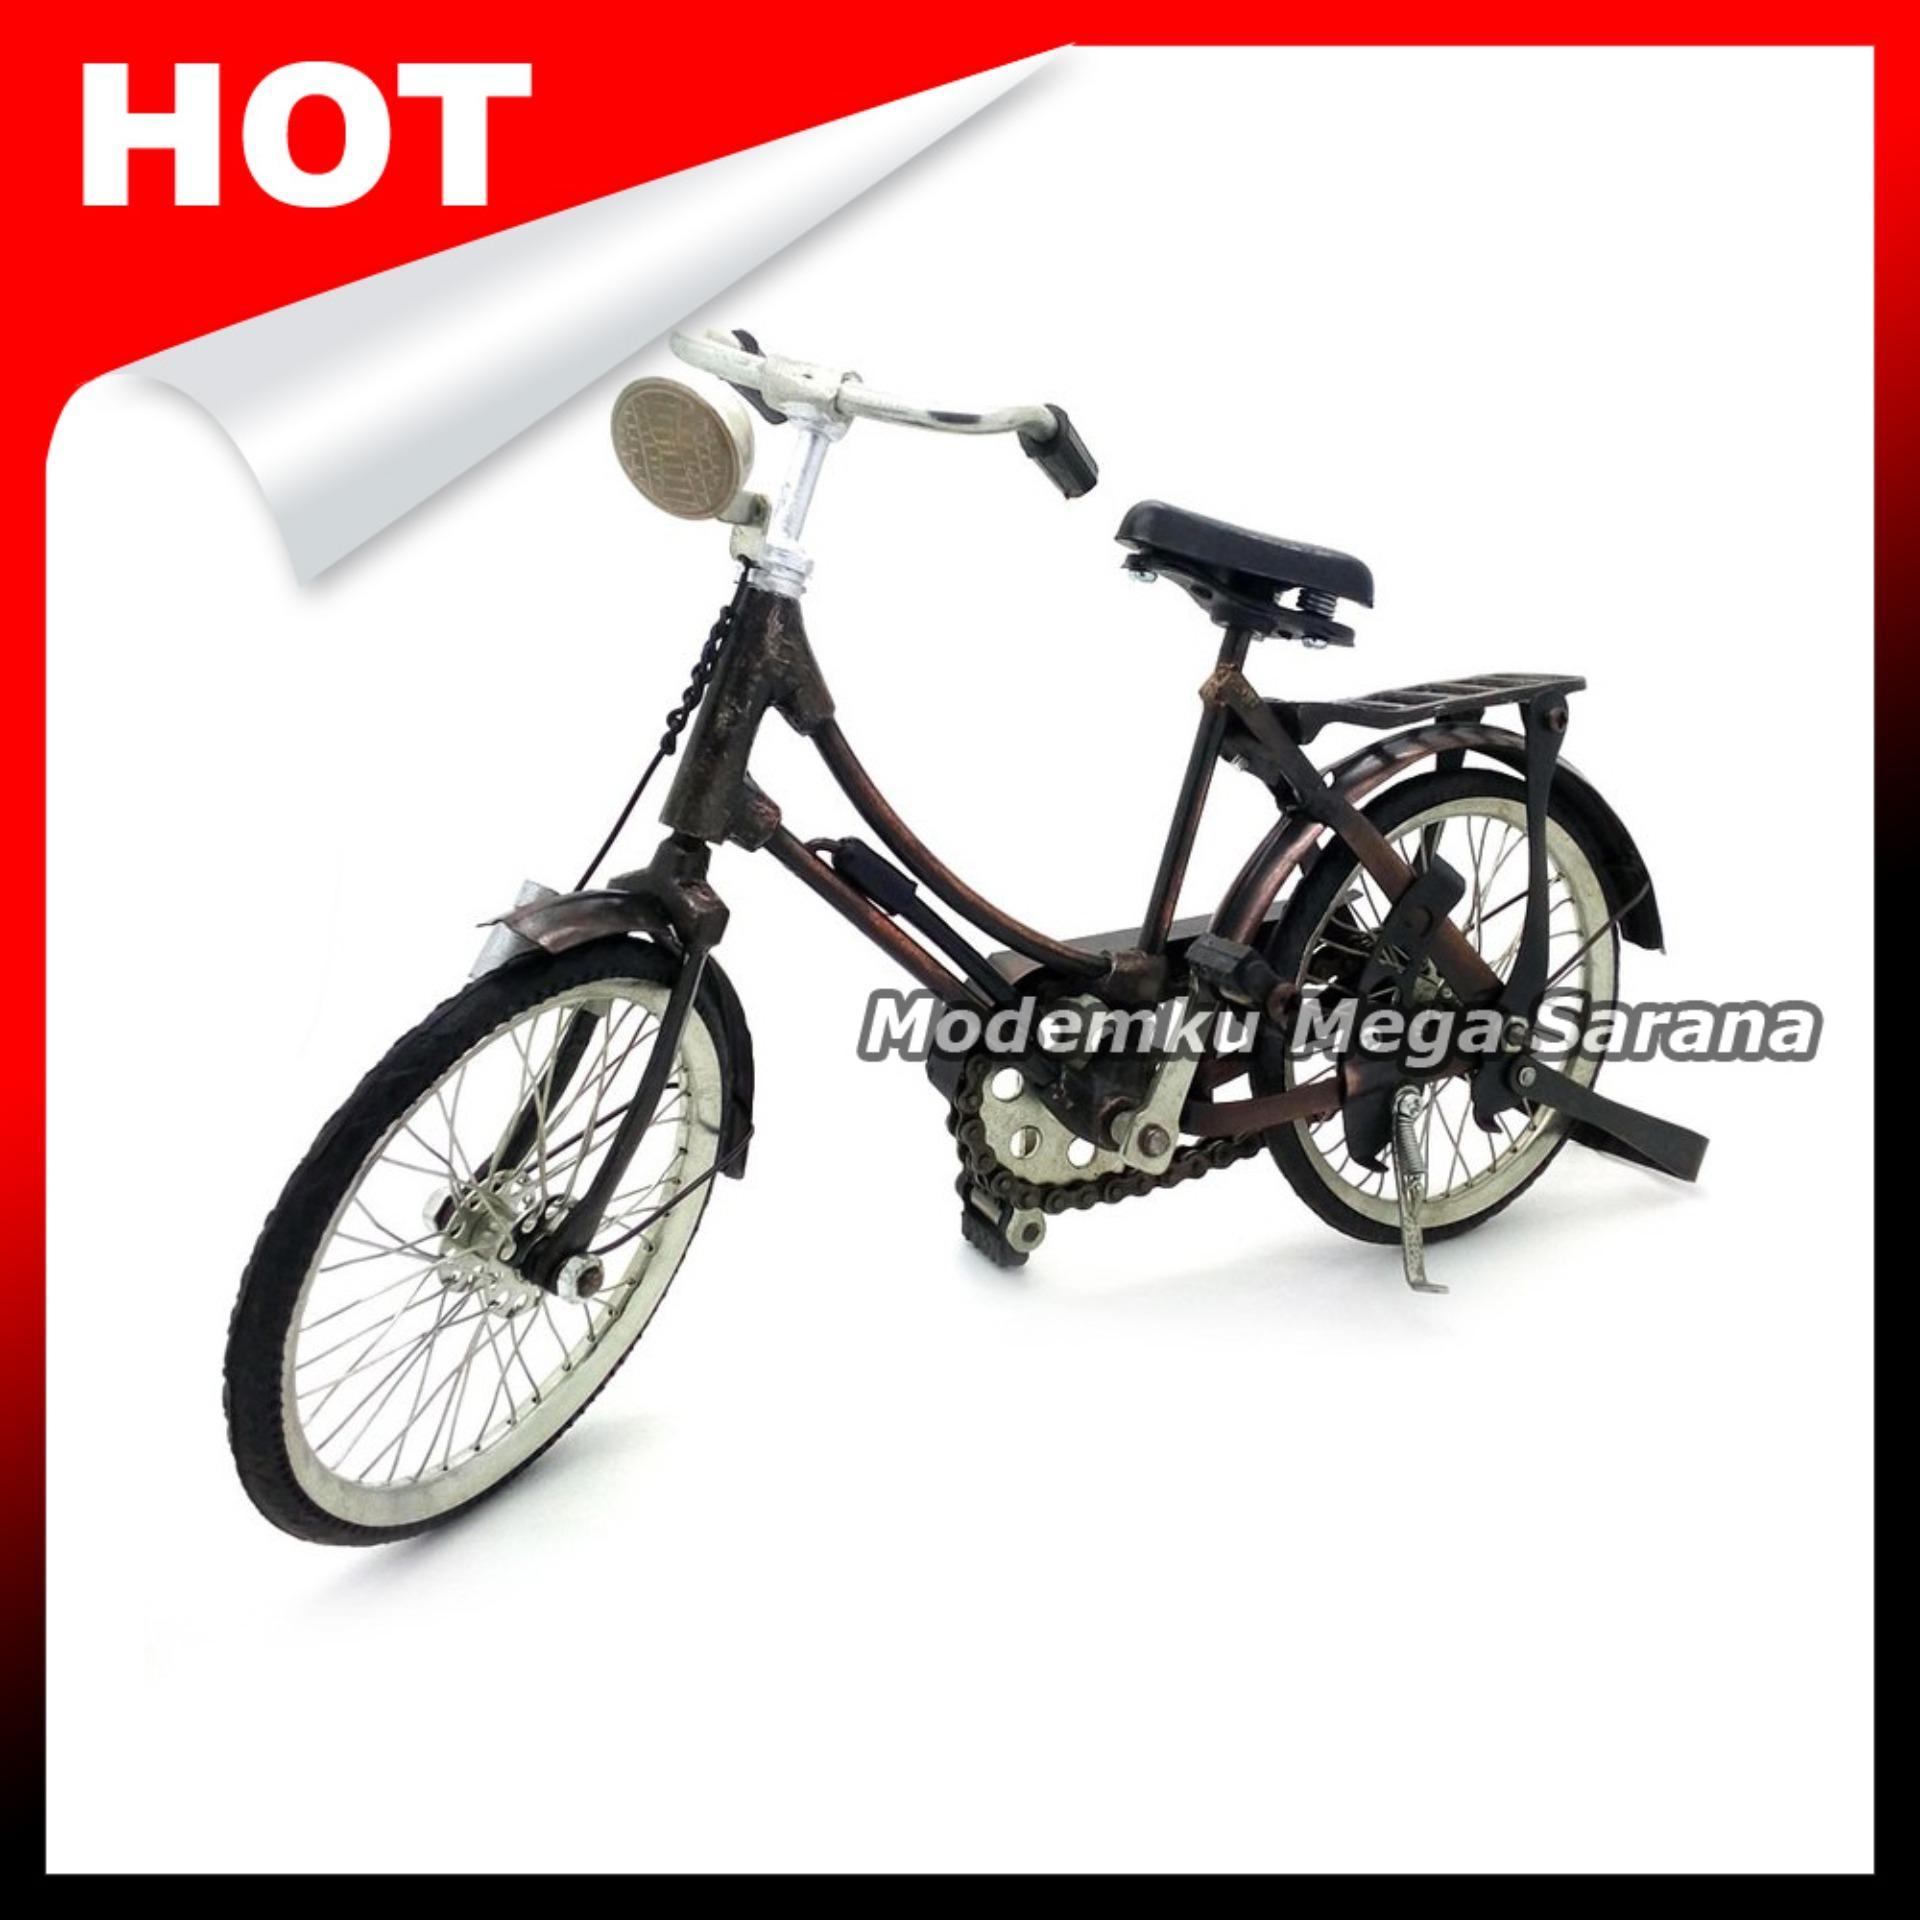 Miniatur Sepeda Ontel Perempuan Sepeda Onthel - Ukuran S 20x6x14 cm